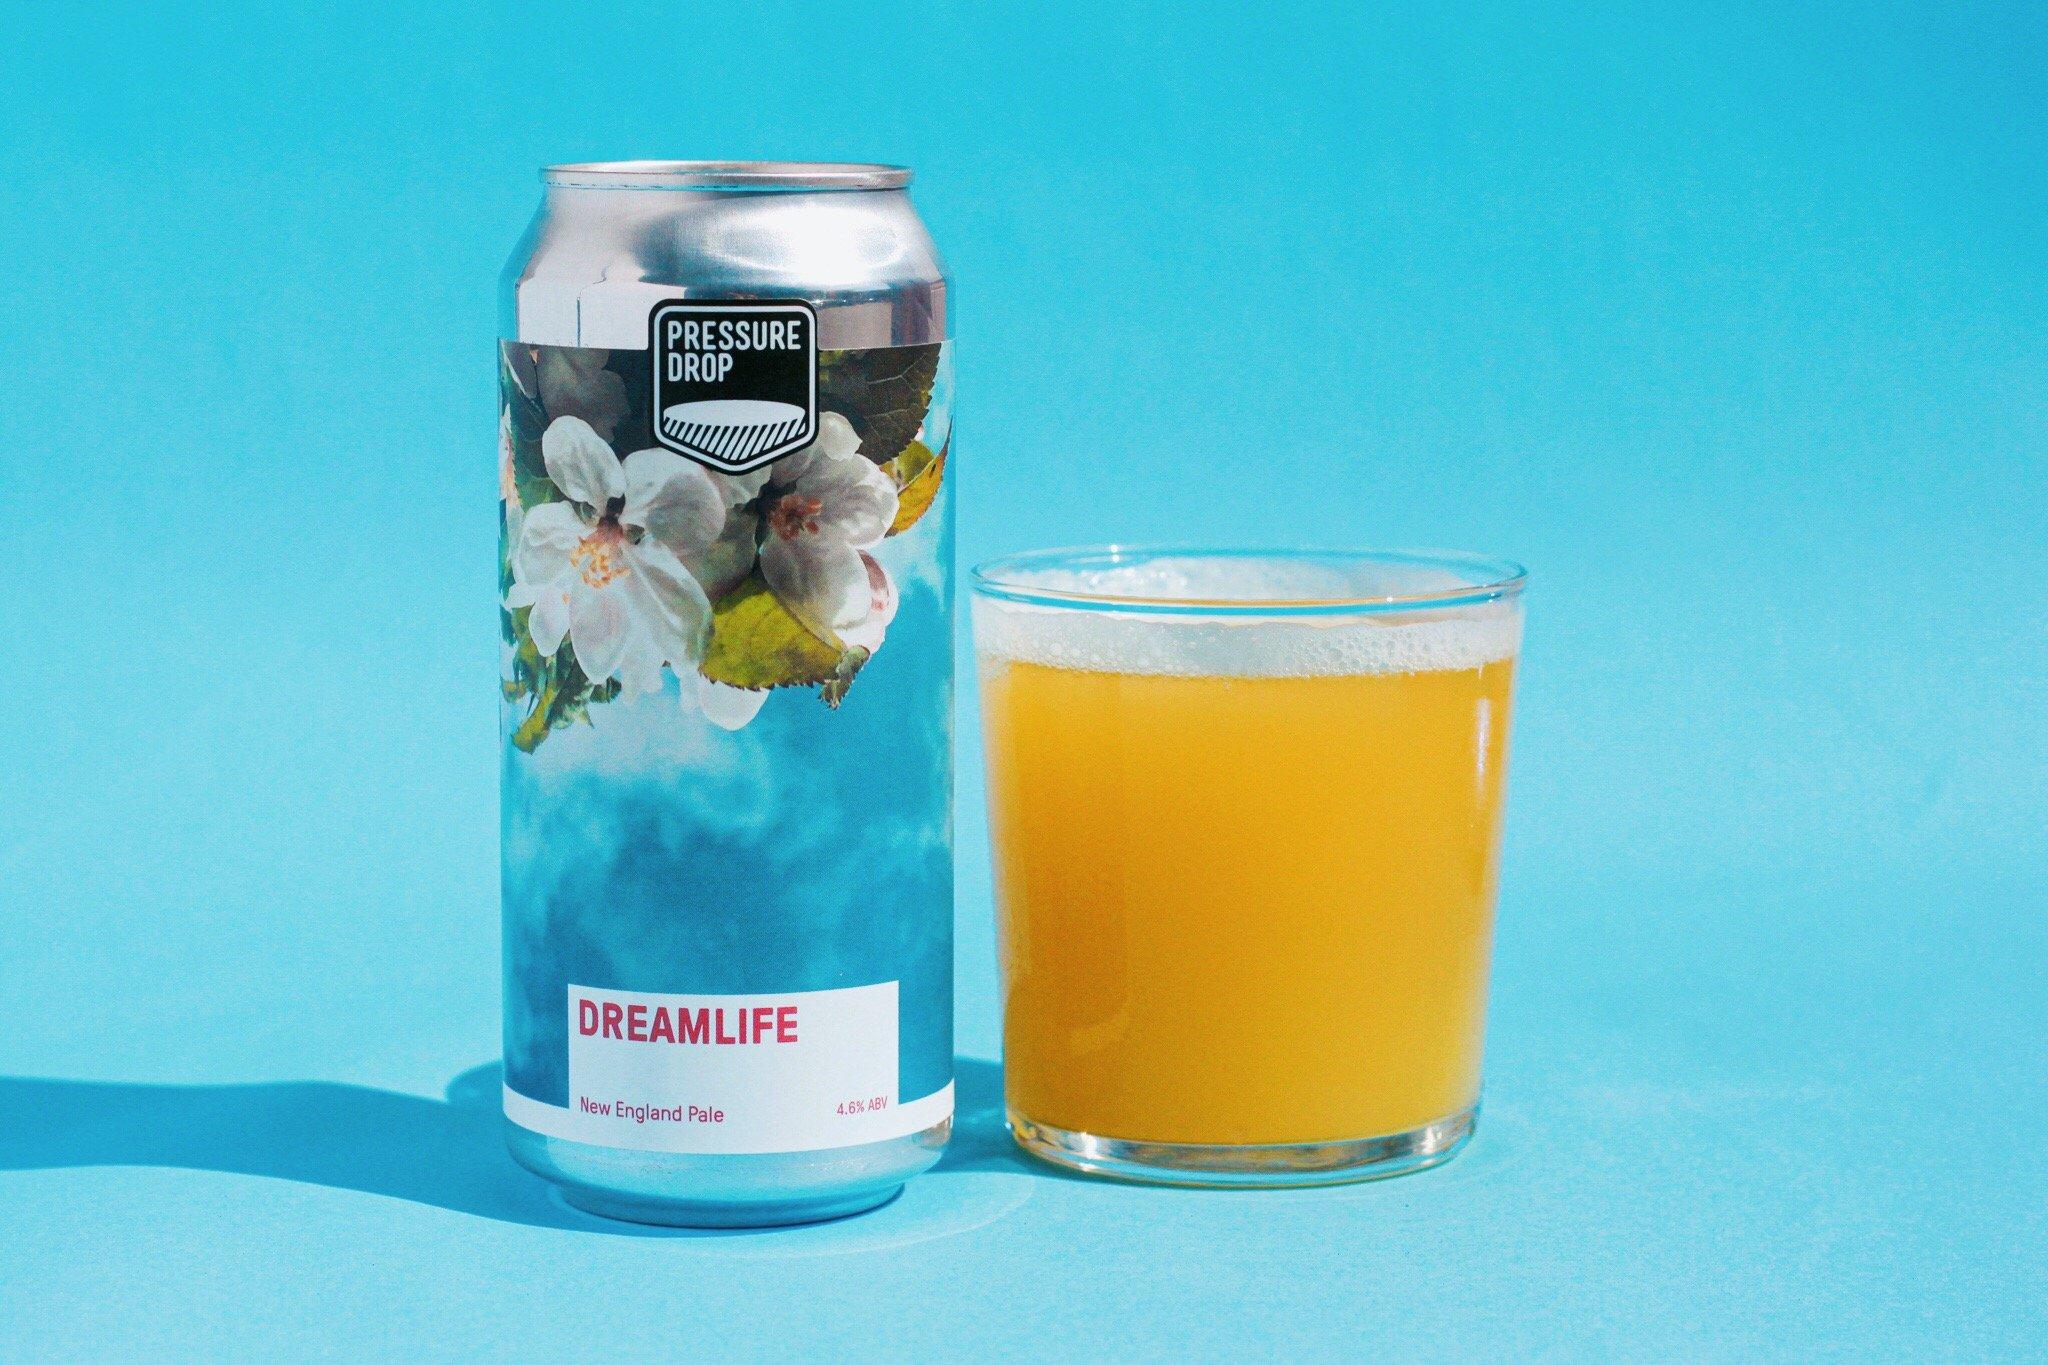 Dreamlife - New England Pale Ale 4.6% 440ml Pressure Drop Brewing